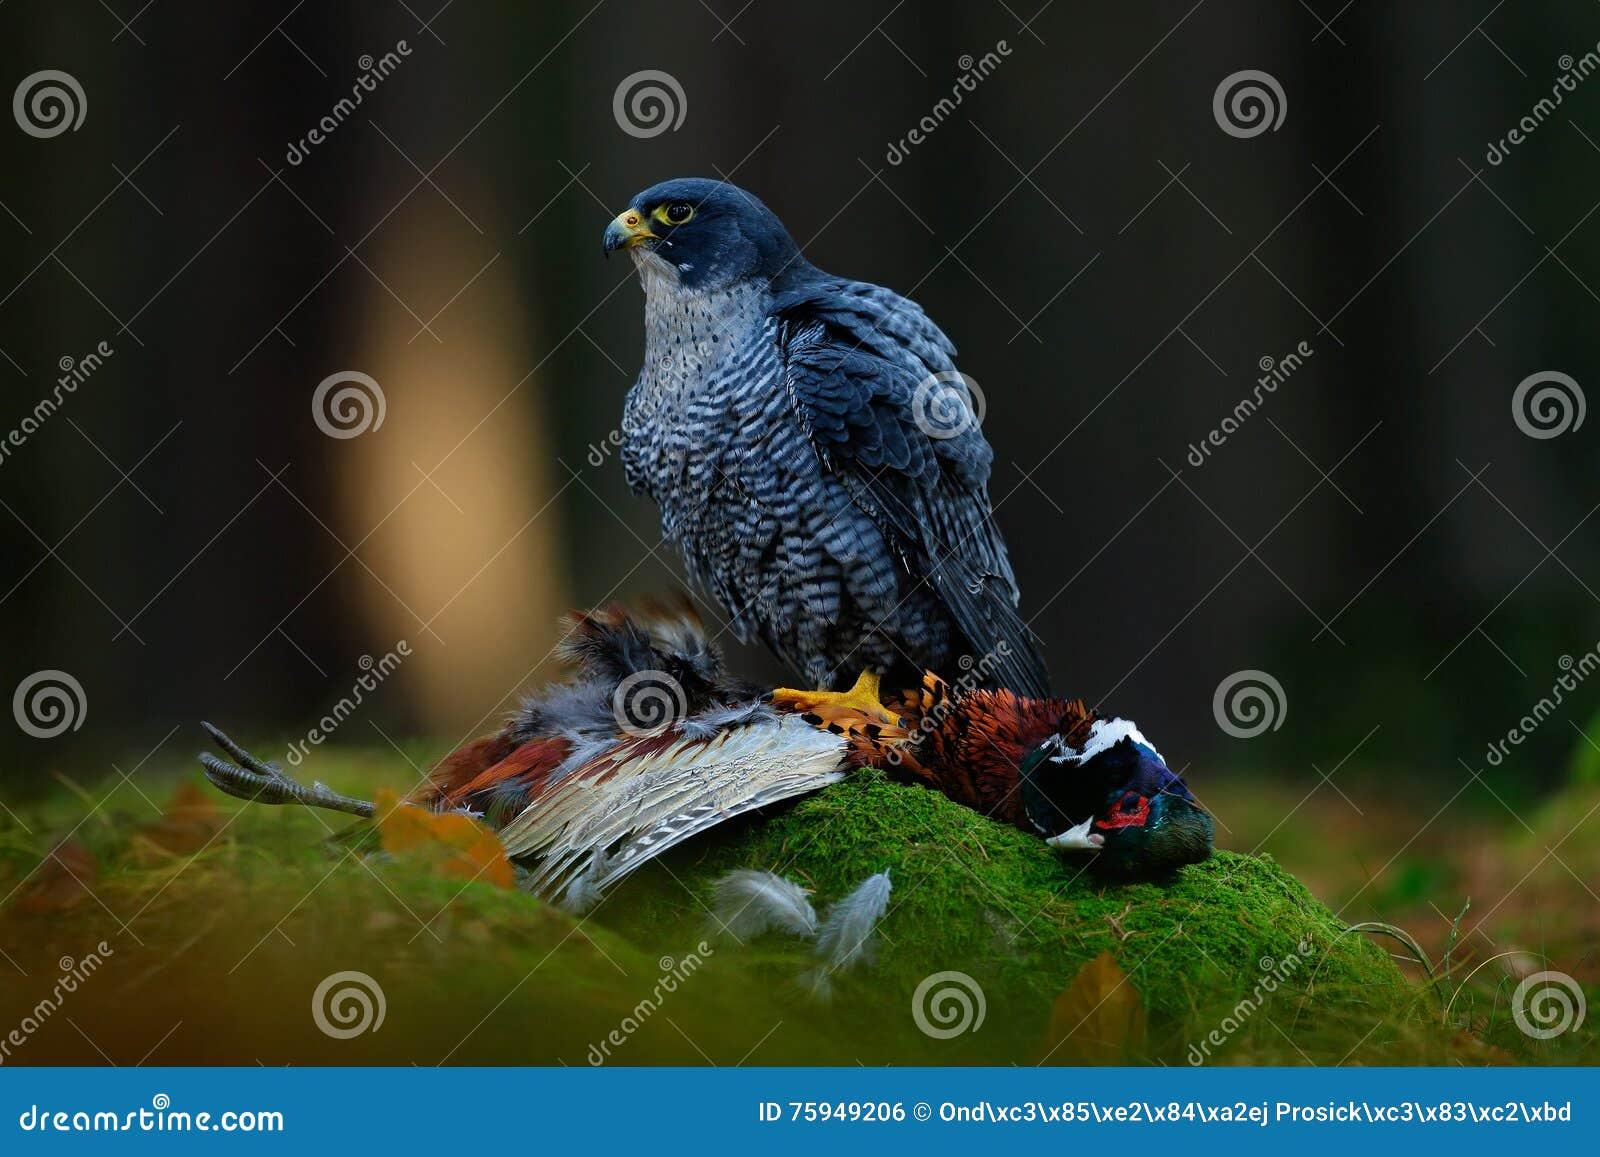 Peregrine falcon with catch Pheasant. Beautiful bird of prey Peregrine Falcon feeding kill big bird on the green moss rock with da